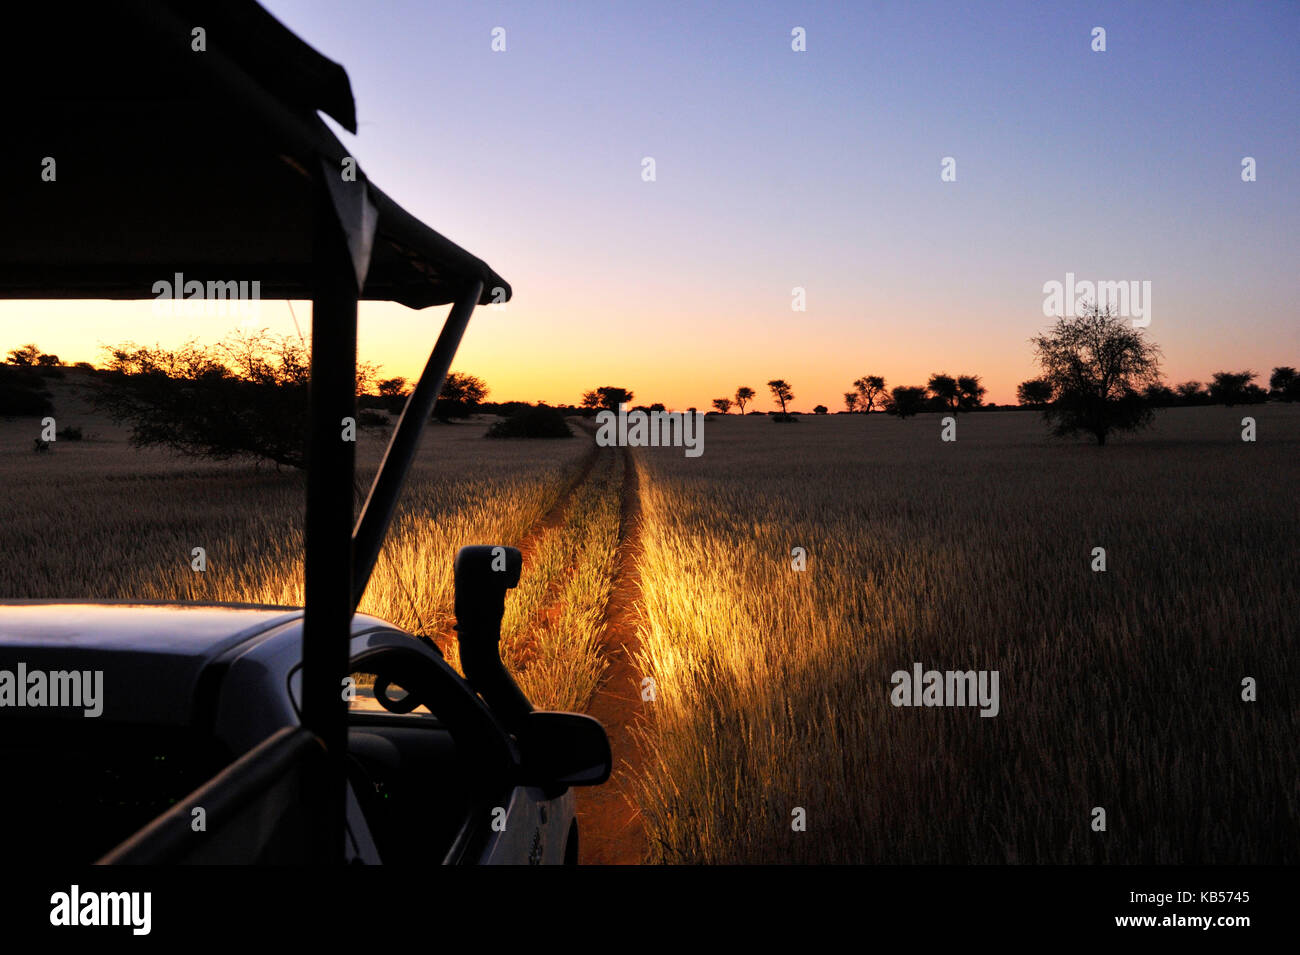 Namibia, el desierto de Kalahari, intu reserva de caza de Kalahari de África, safari nocturno. Imagen De Stock